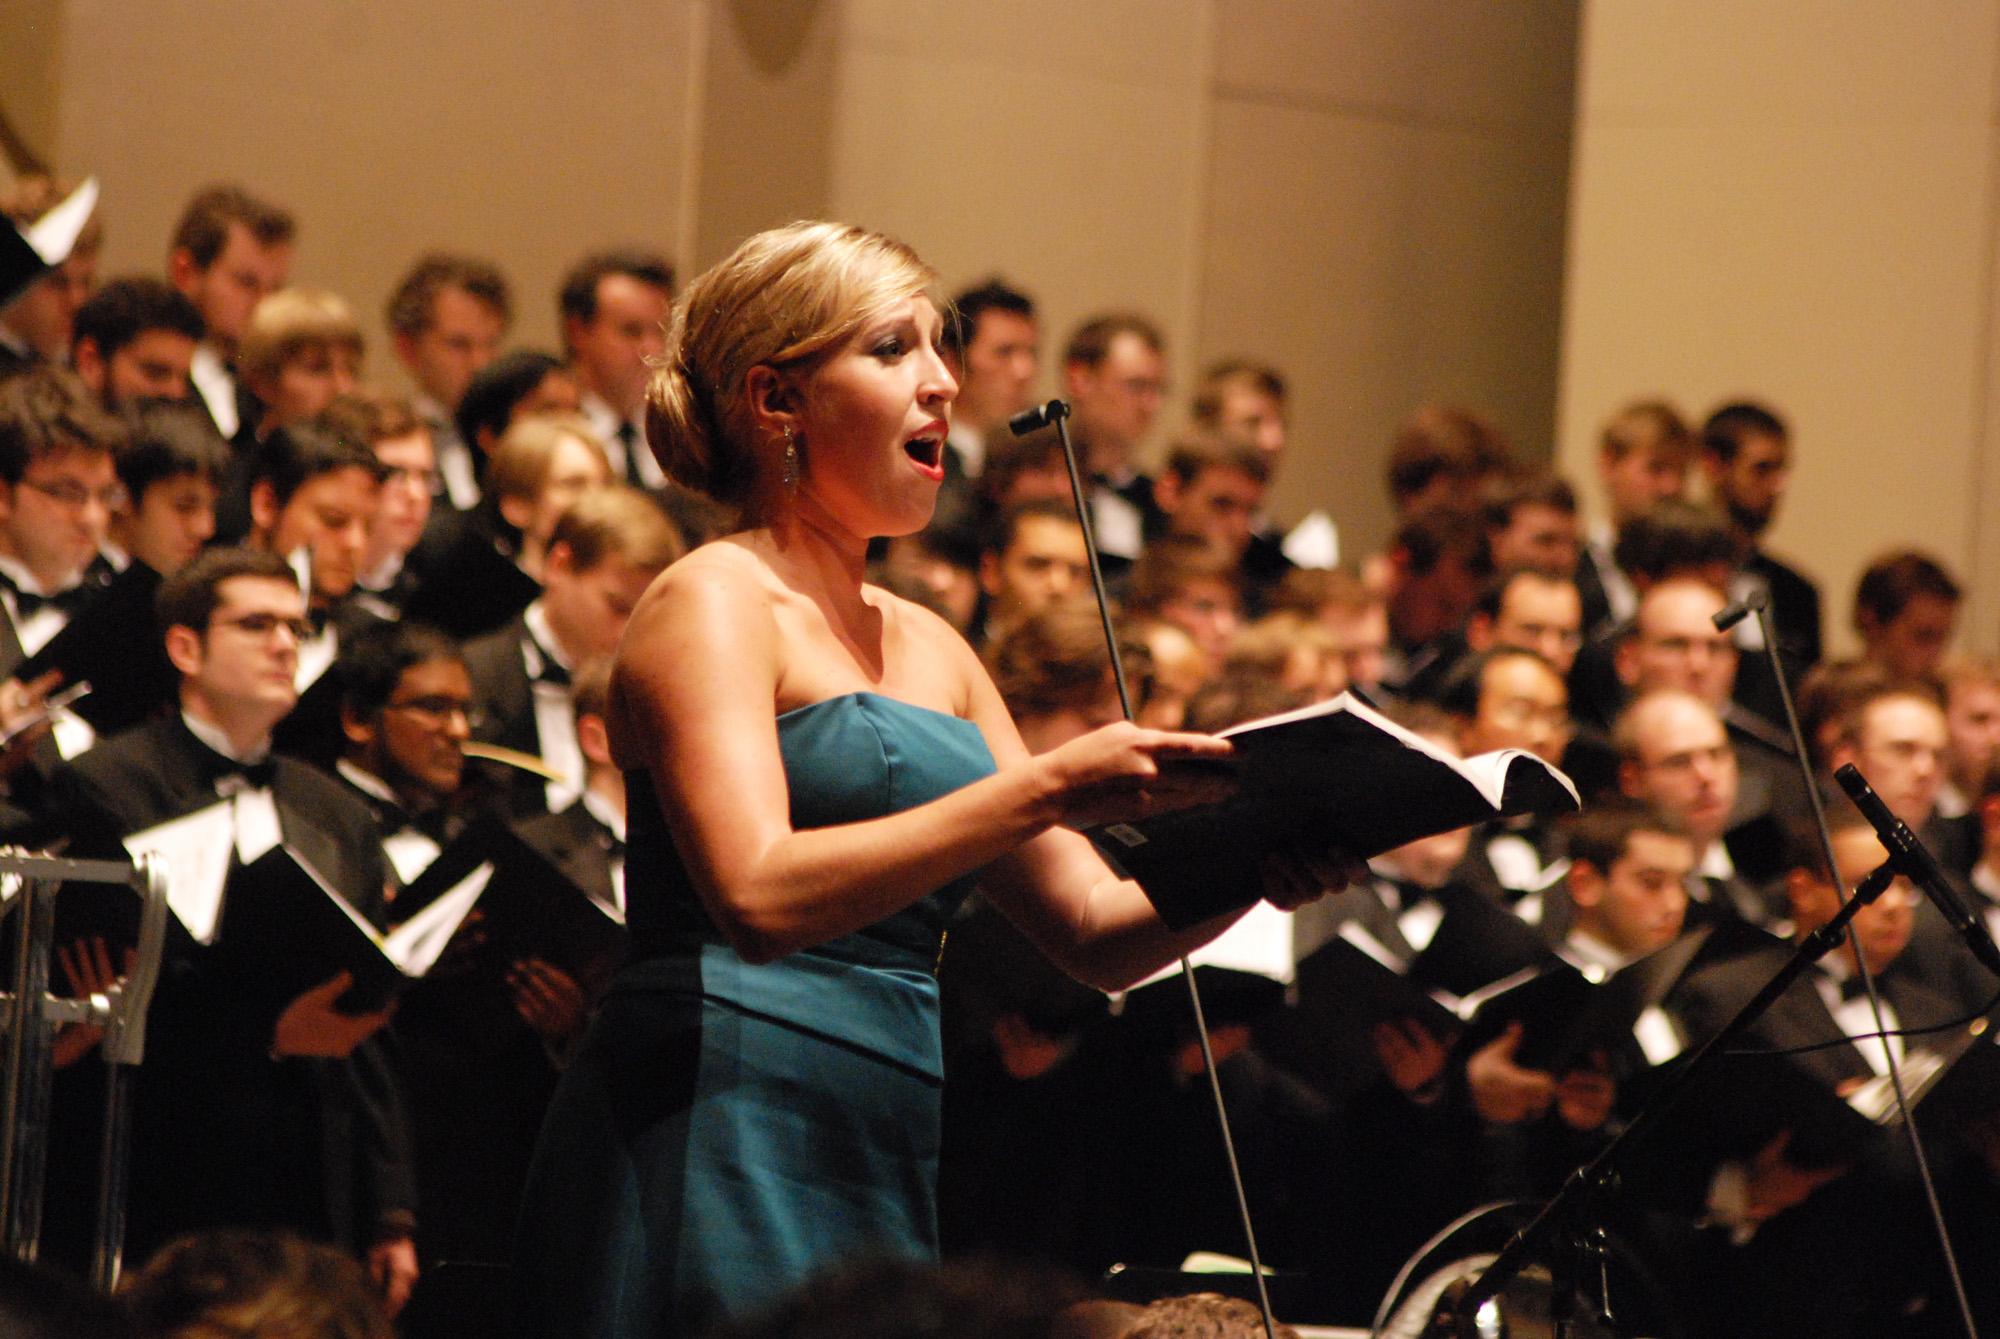 College - Indiana University Jacobs School of Music  6